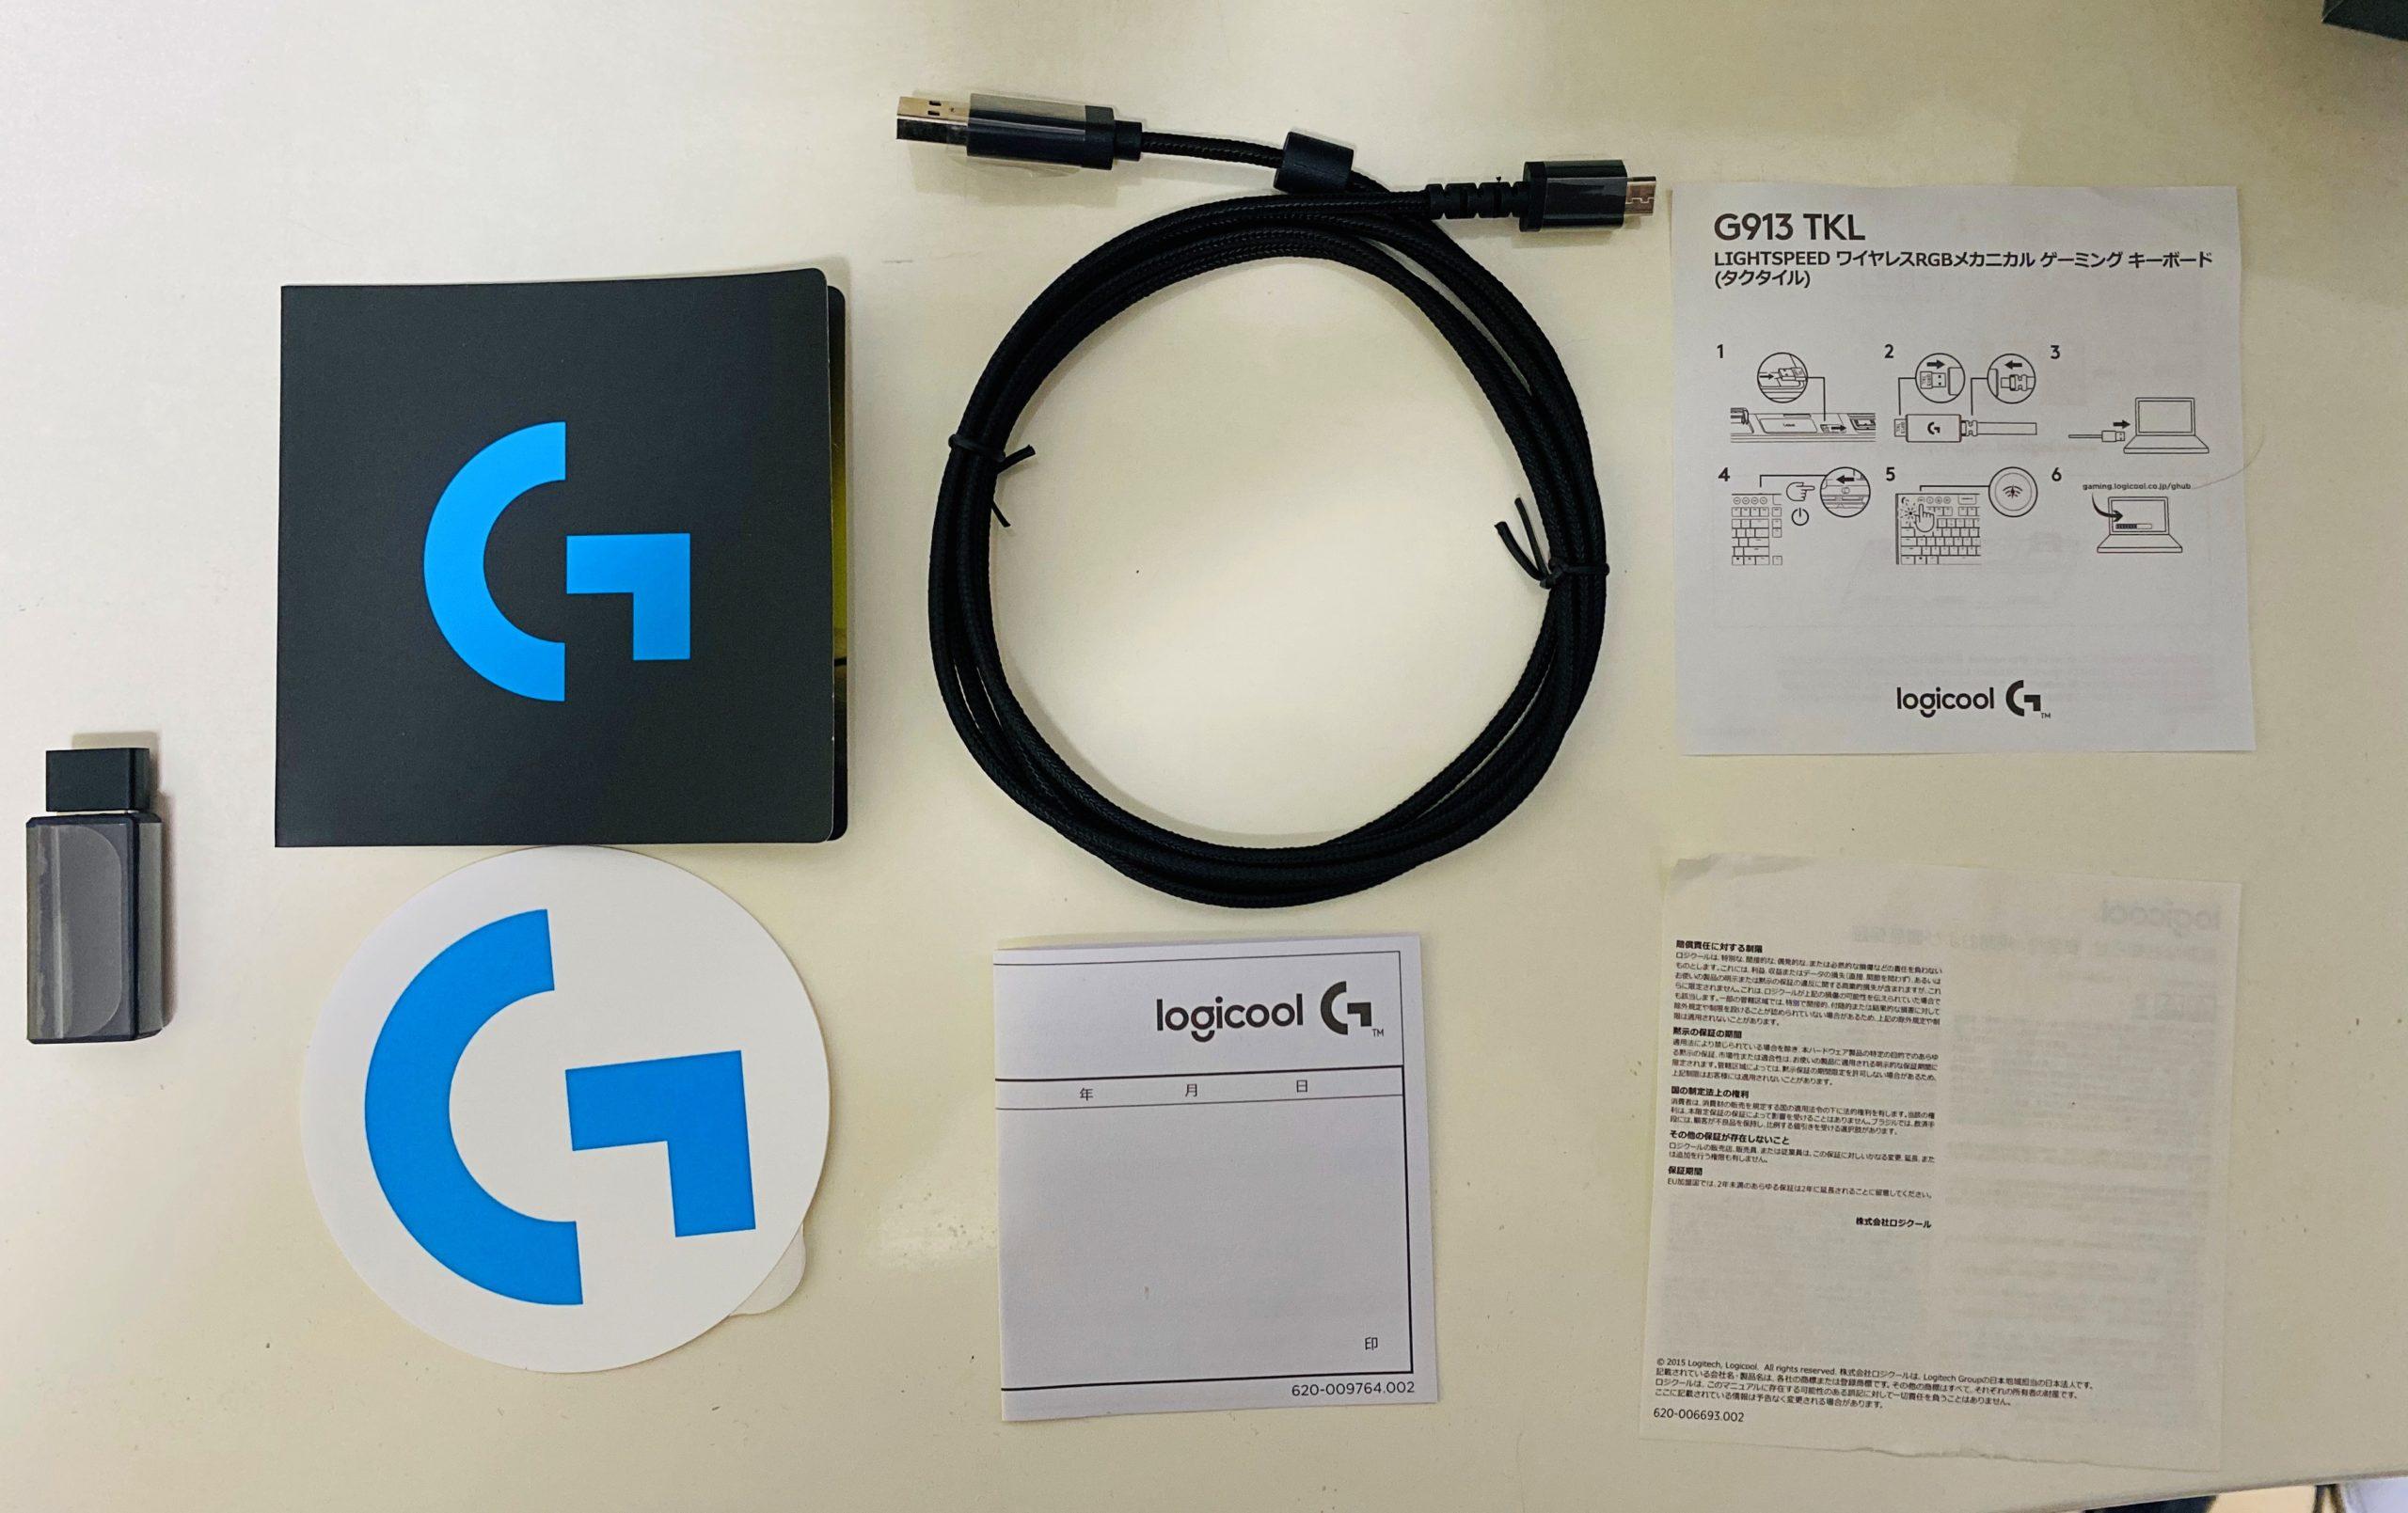 Logicool G913-TKL-LNBK付属品